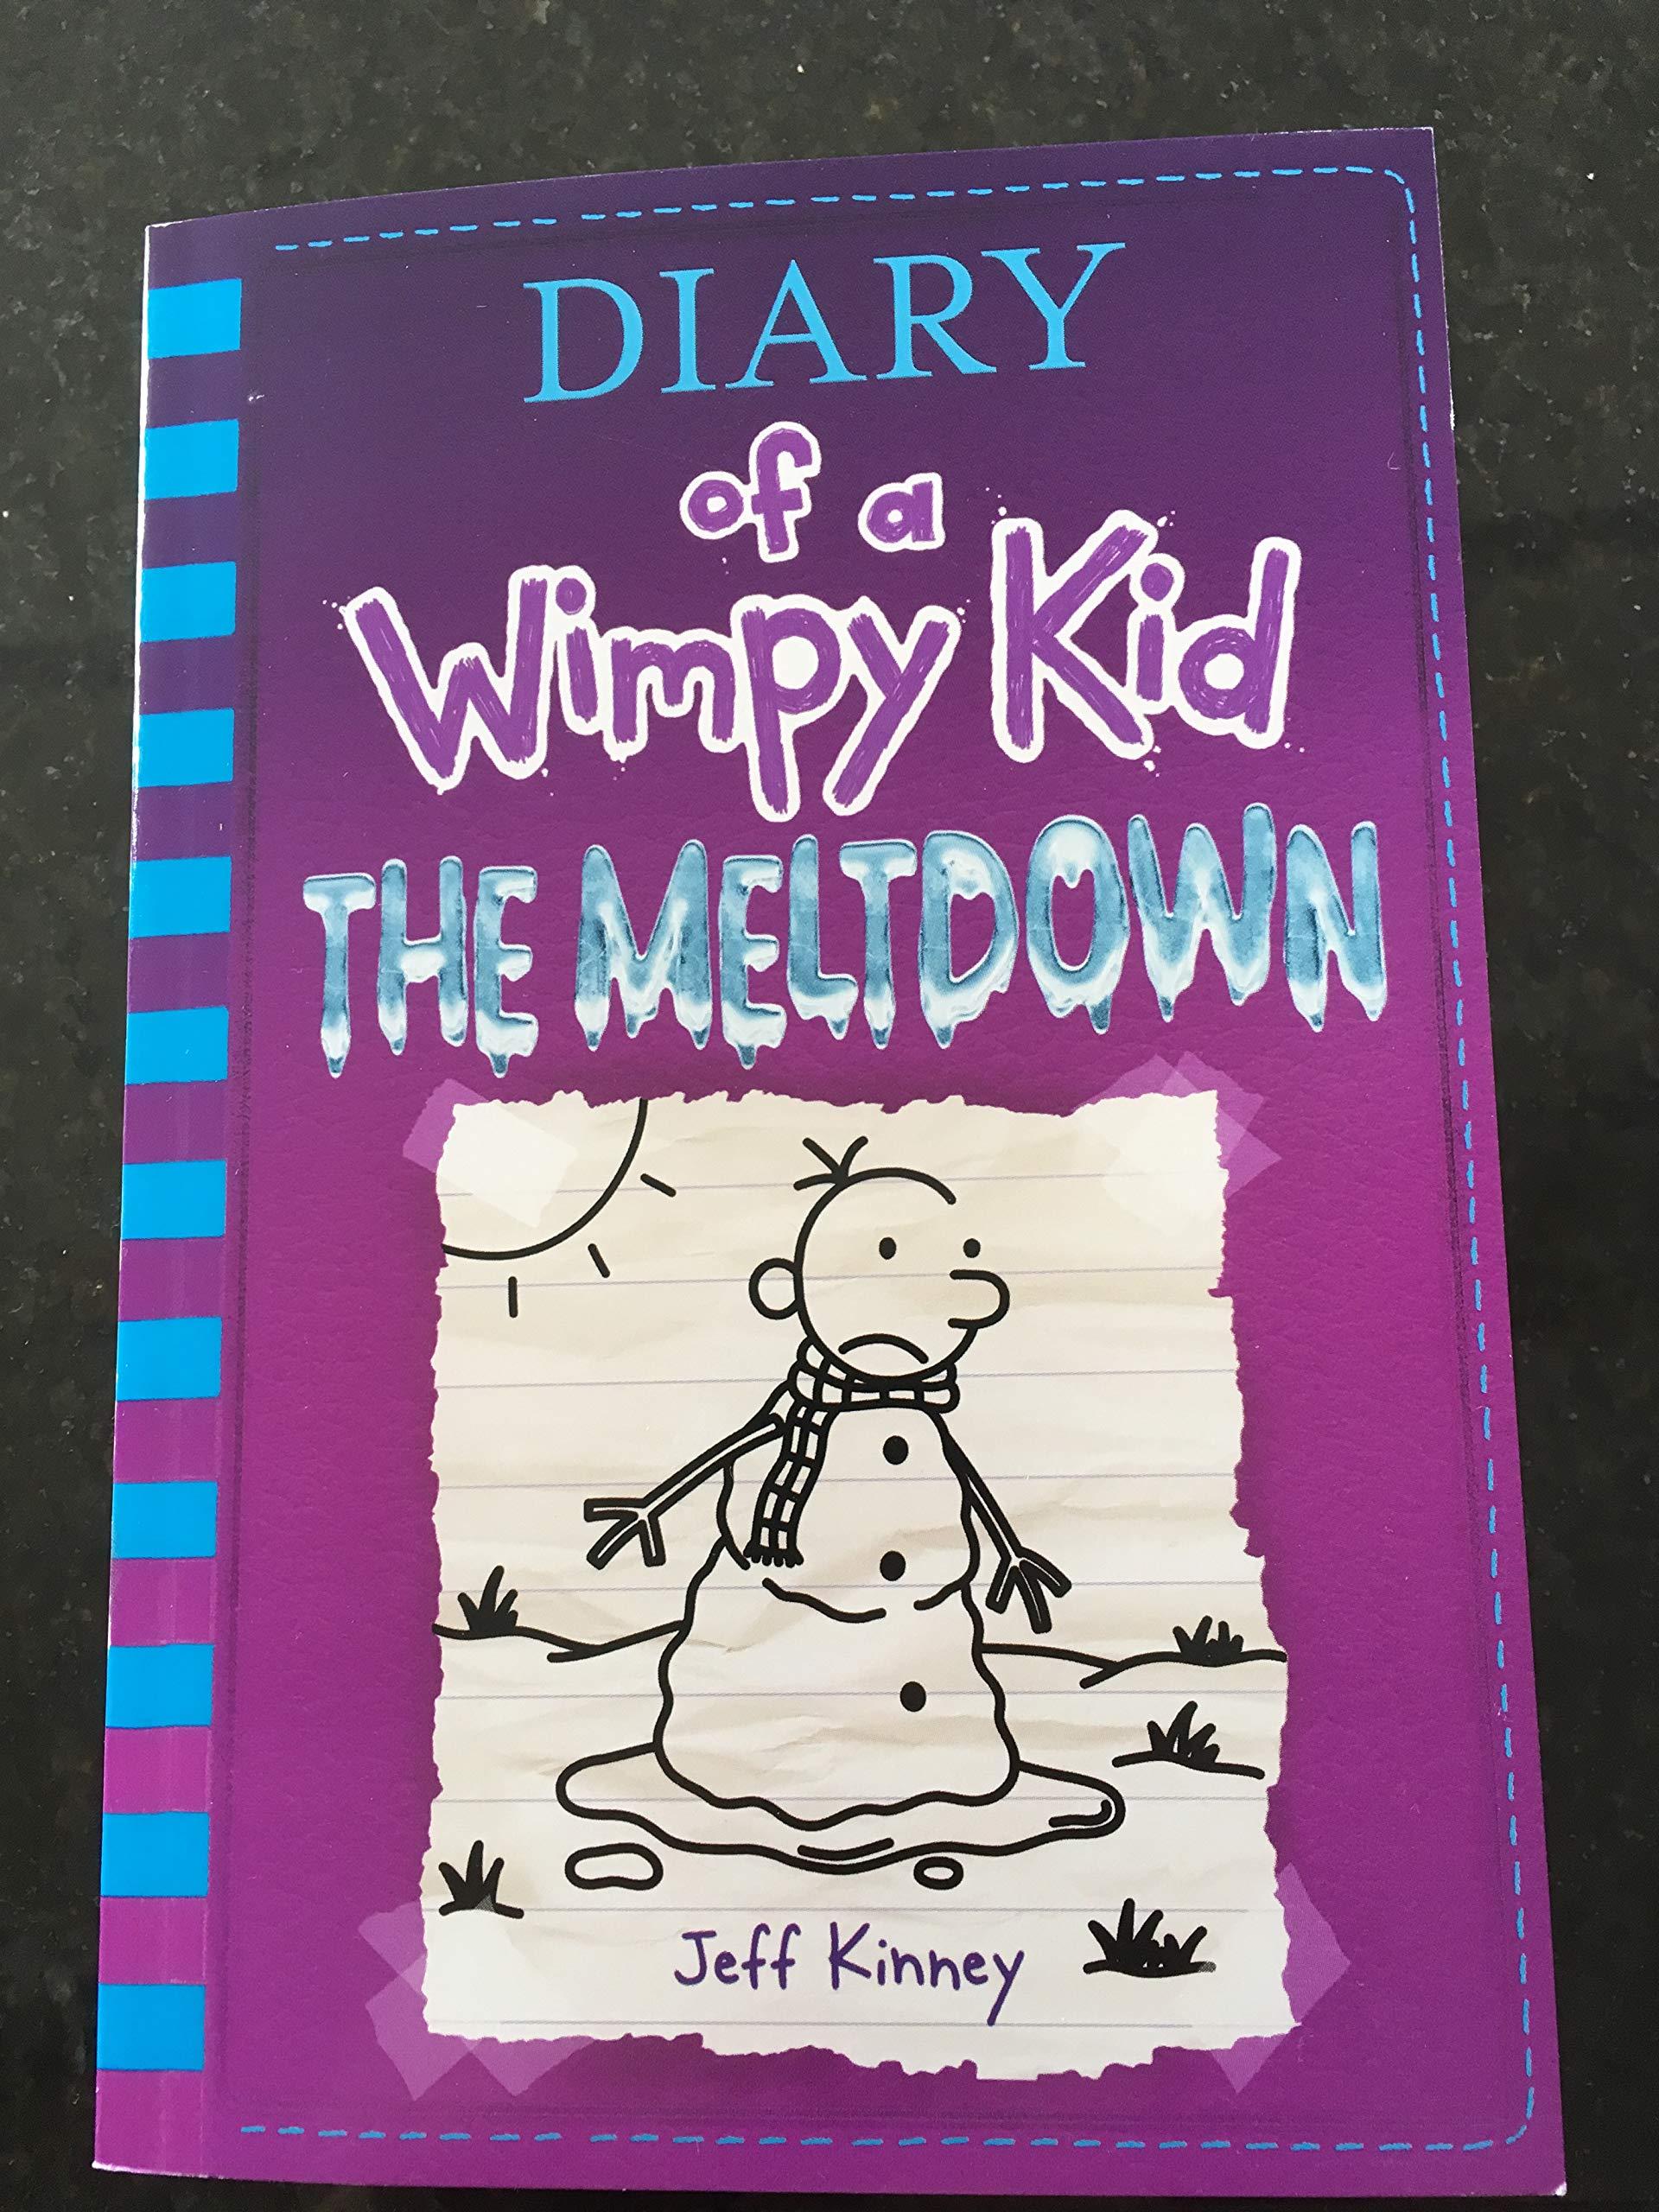 Diary Of A Wimpy Kid The Meltdown Book 13 Jeff Kinney 9781419736421 Amazon Com Books